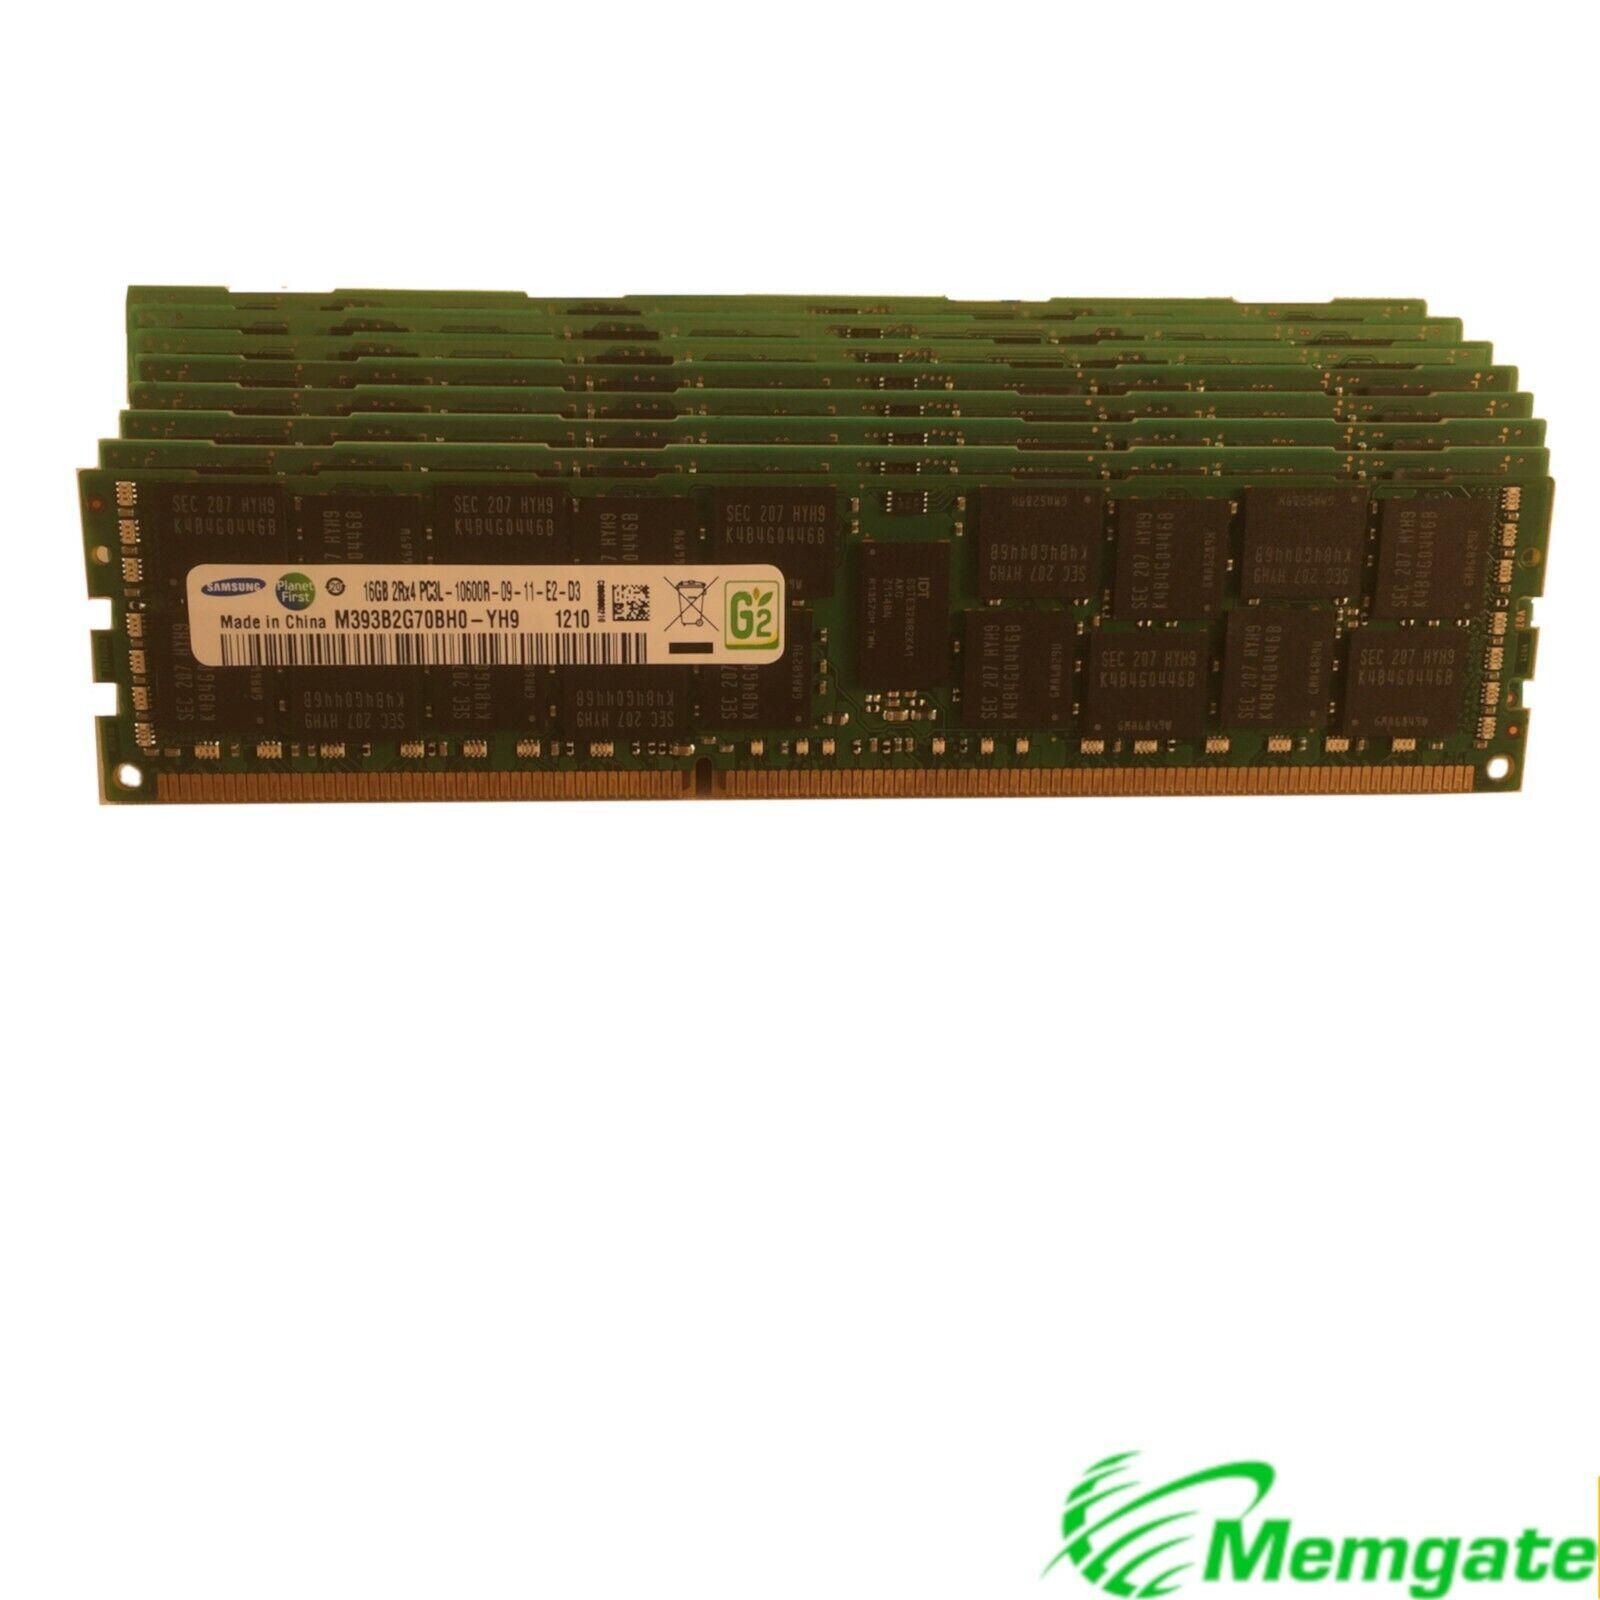 96GB (6x16GB) DDR3 -1333 ECC Reg Memory for Apple Mac Pro Mid 2010 5,1 12 Core. Buy it now for 205.65